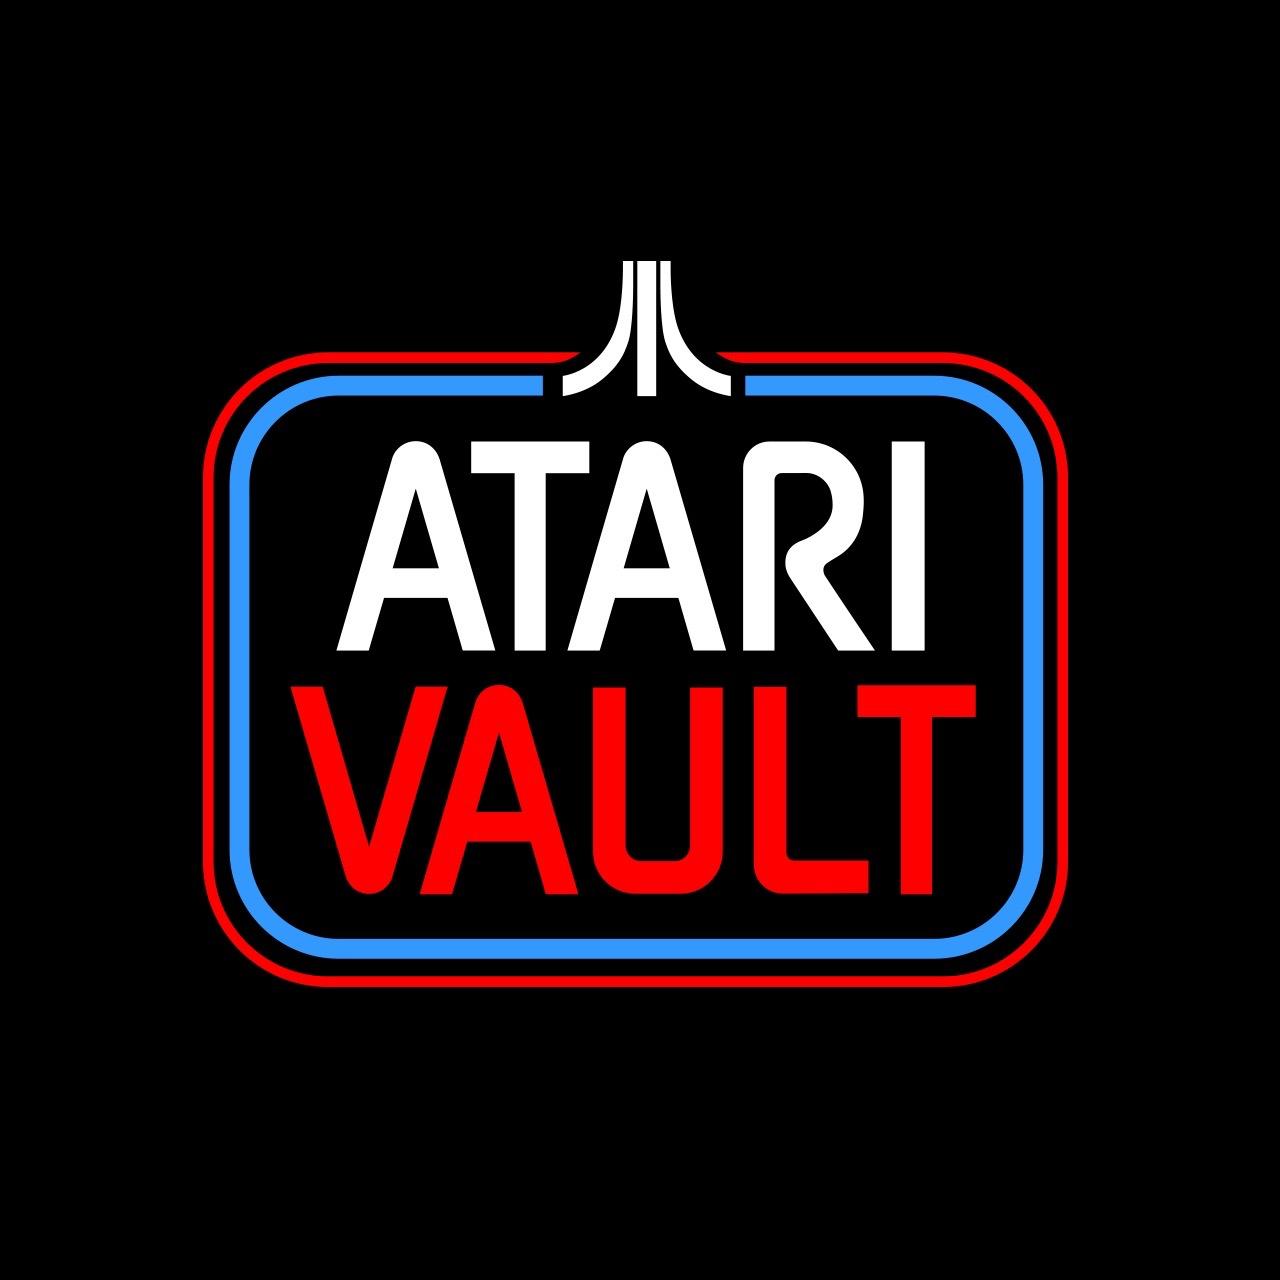 [Steam] Atari Vault - 69p - Fanatical